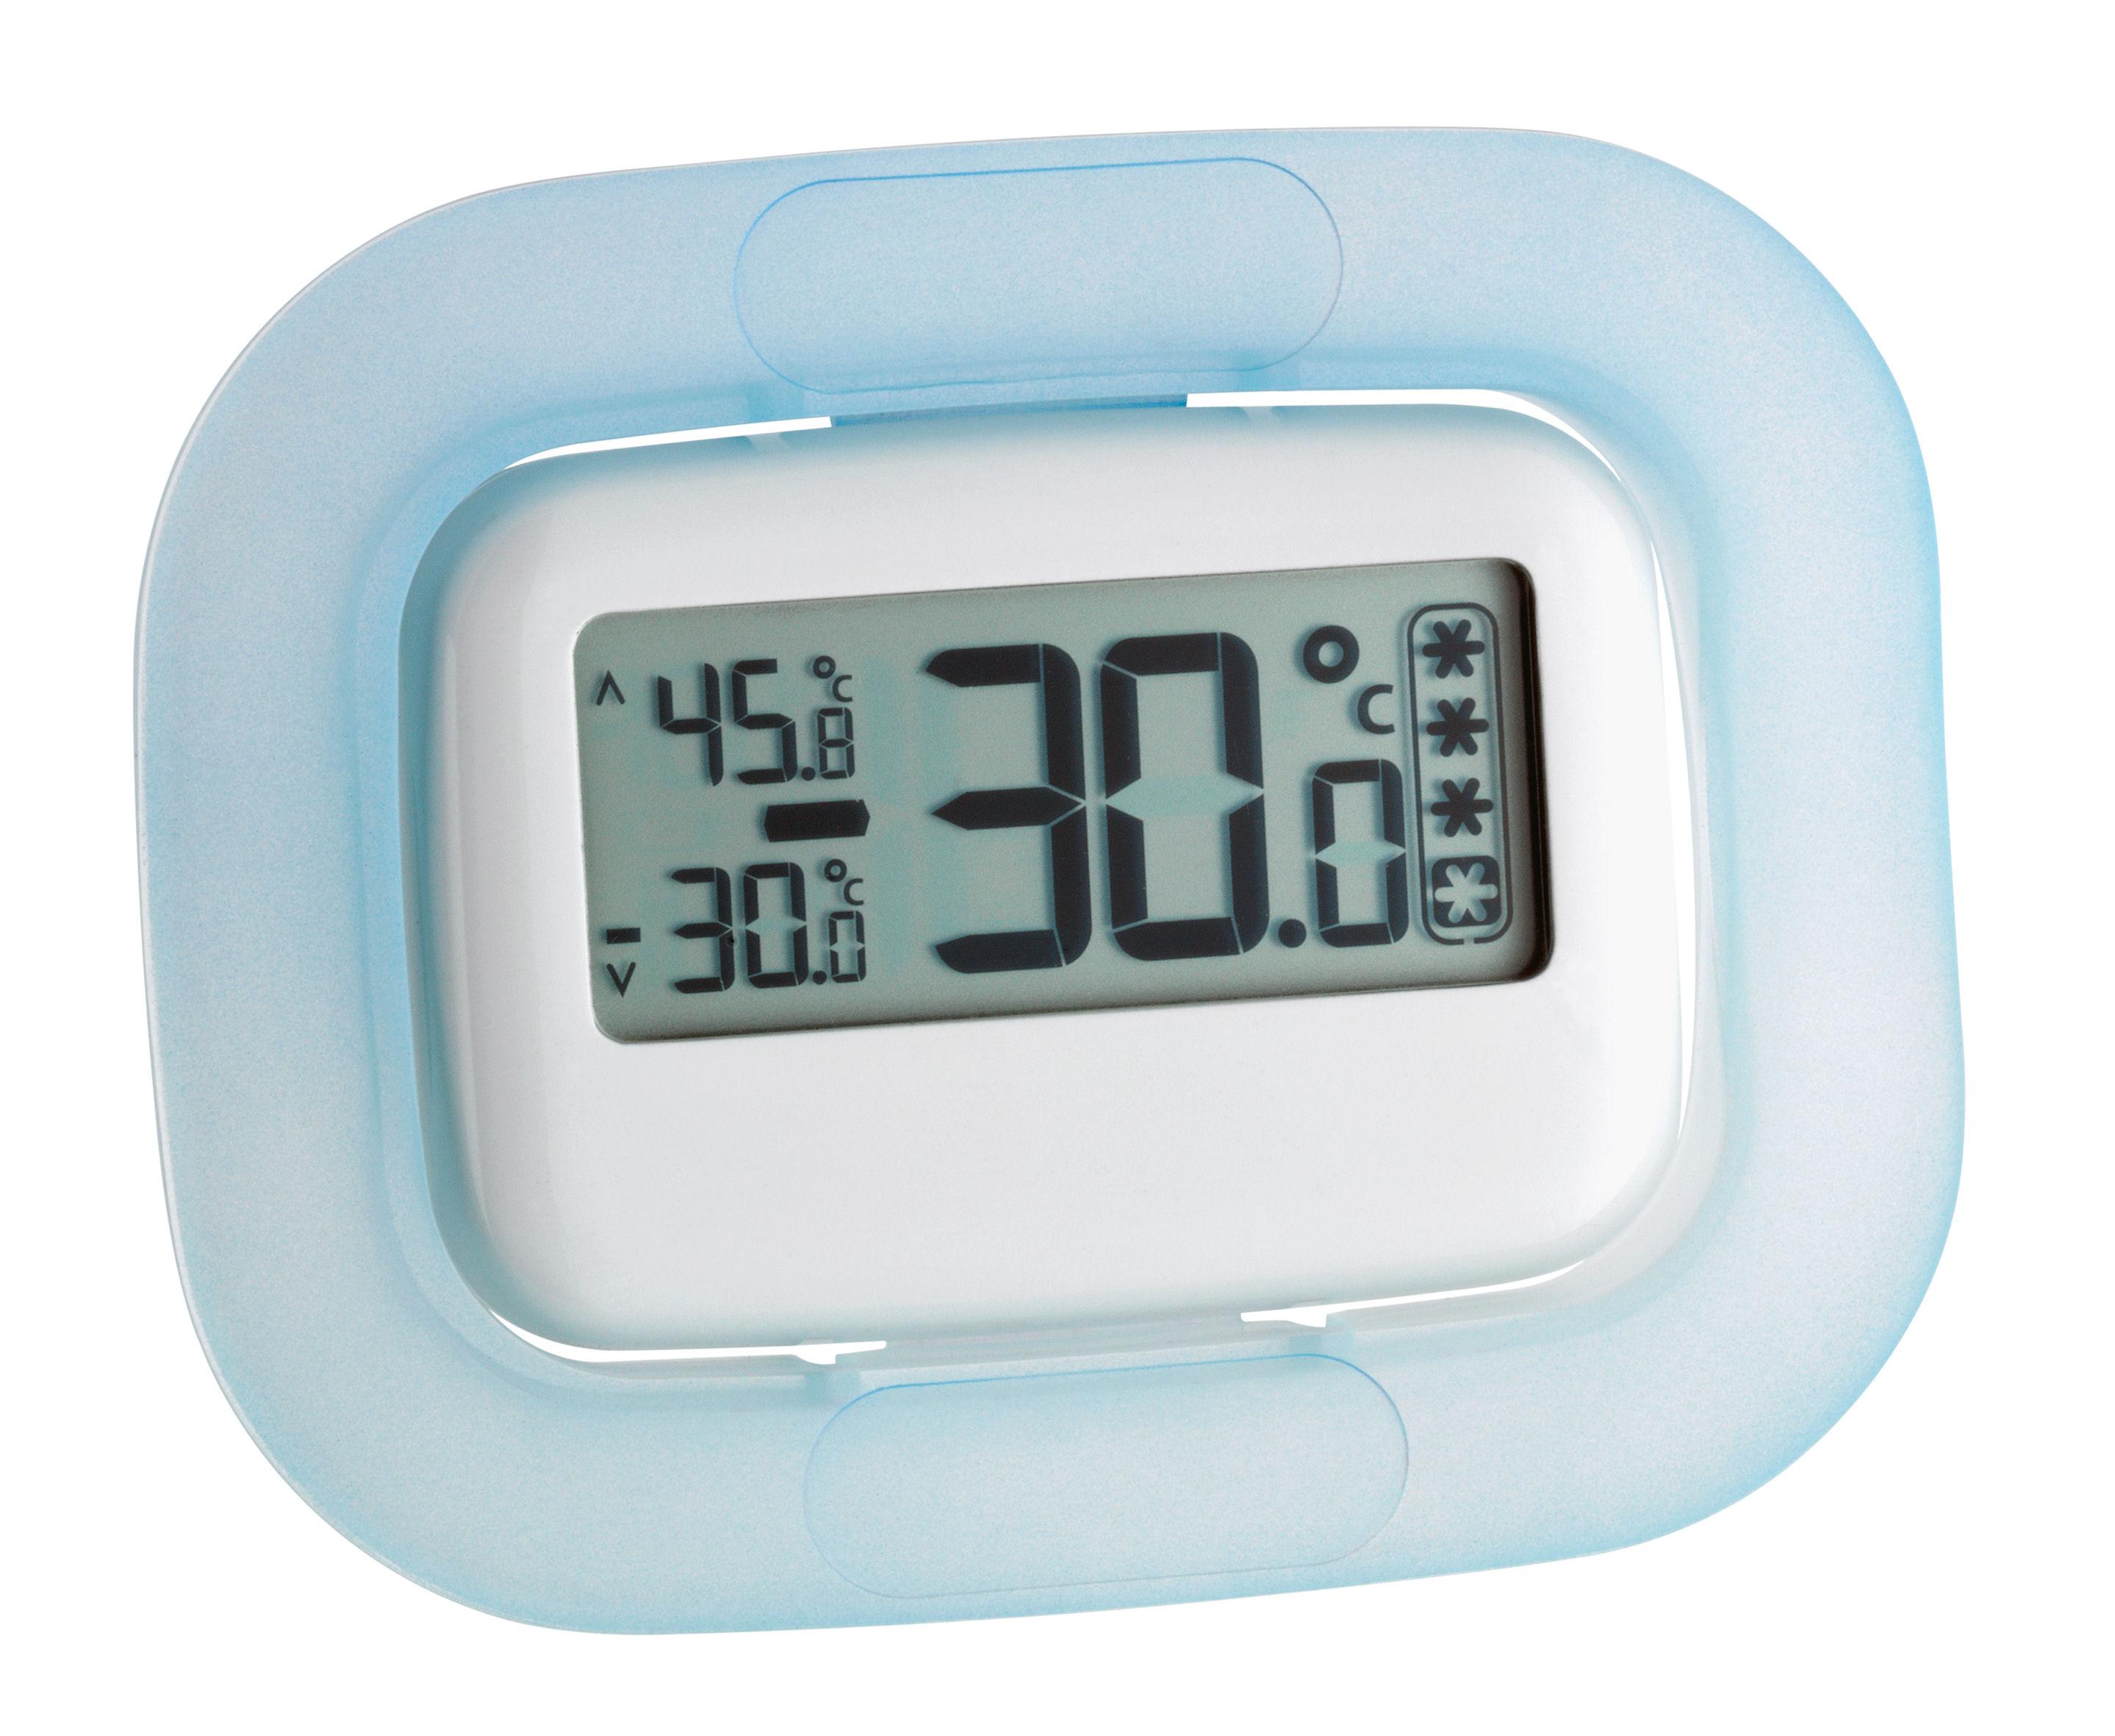 tfa dostmann k hlschrank gefrierschrank thermometer. Black Bedroom Furniture Sets. Home Design Ideas